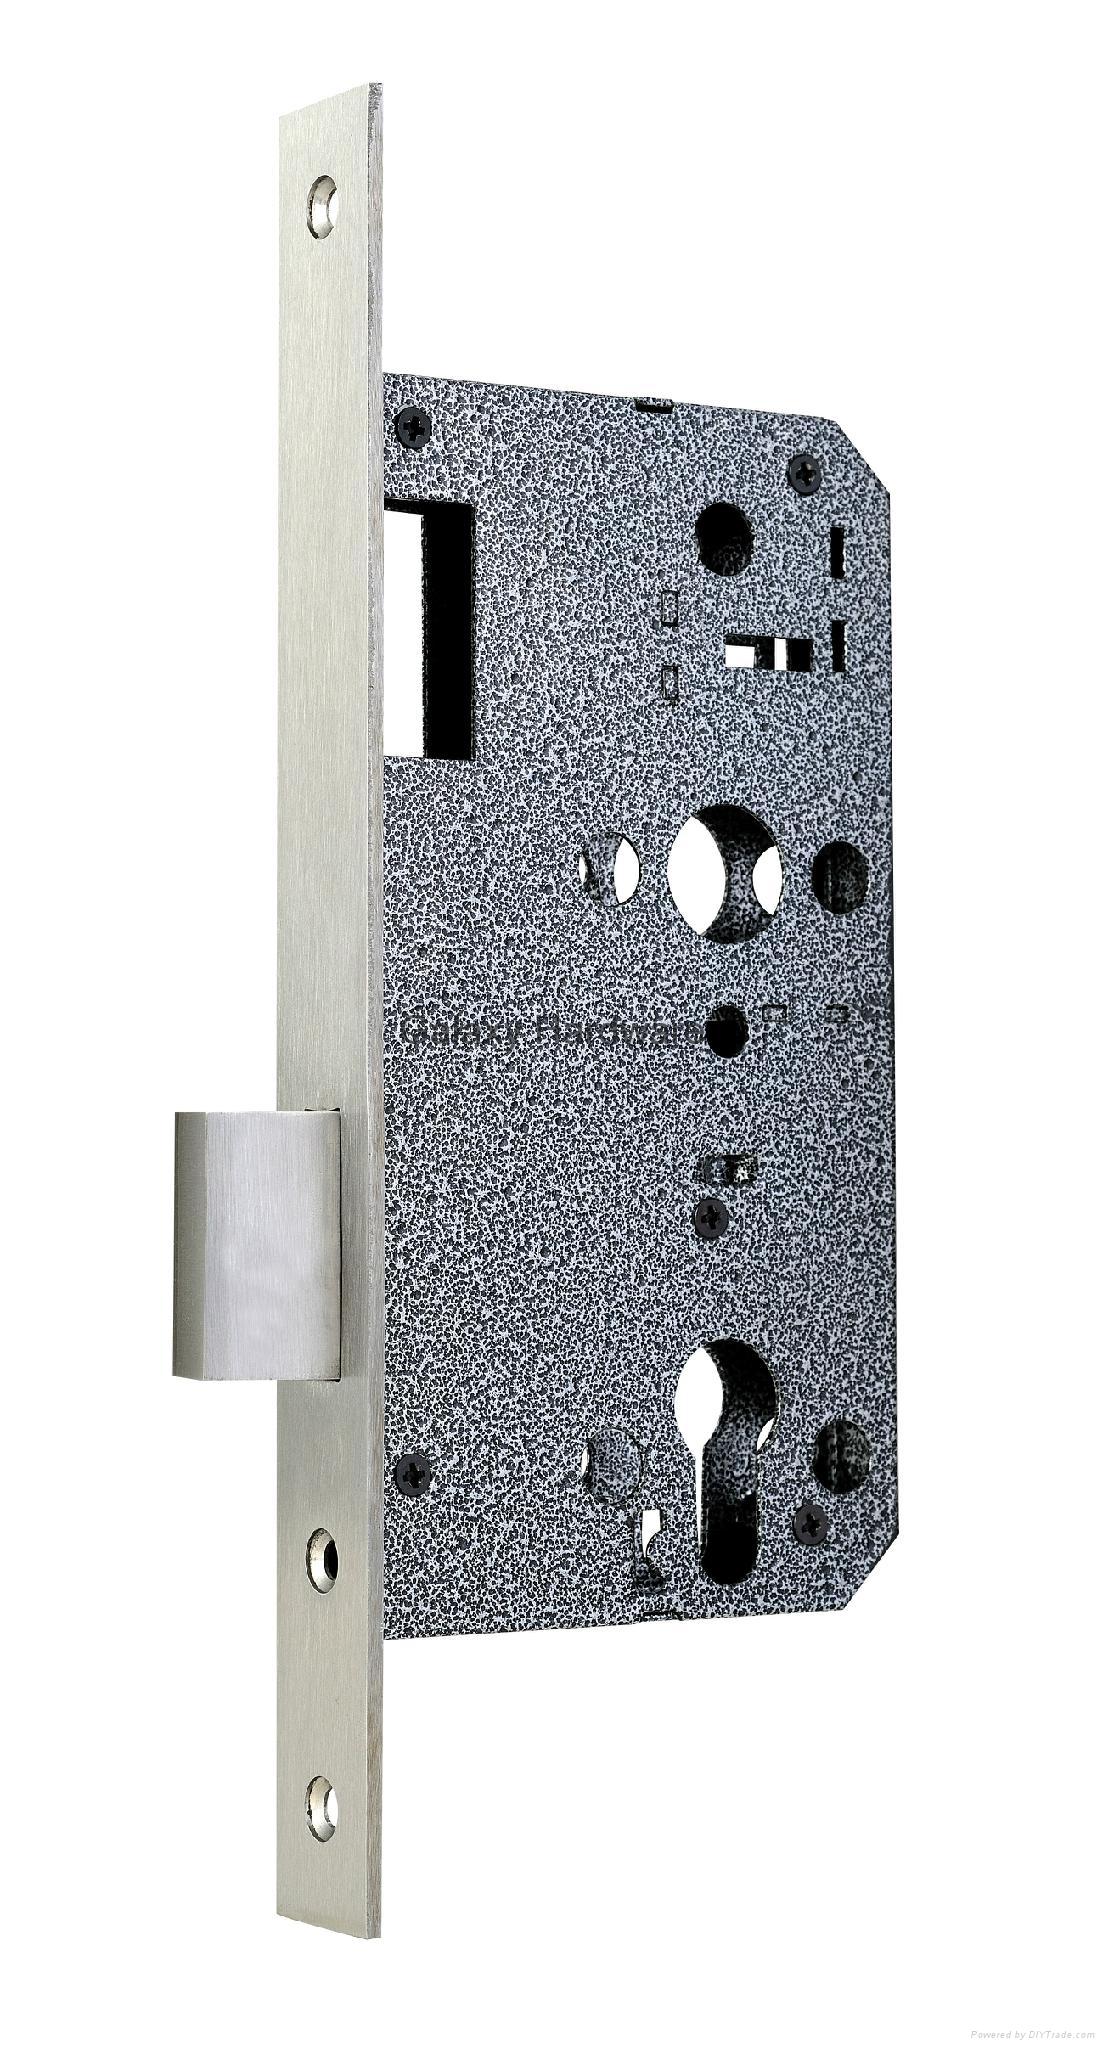 Dead Lock, Euro Profile Mortise Type, Item:6072D